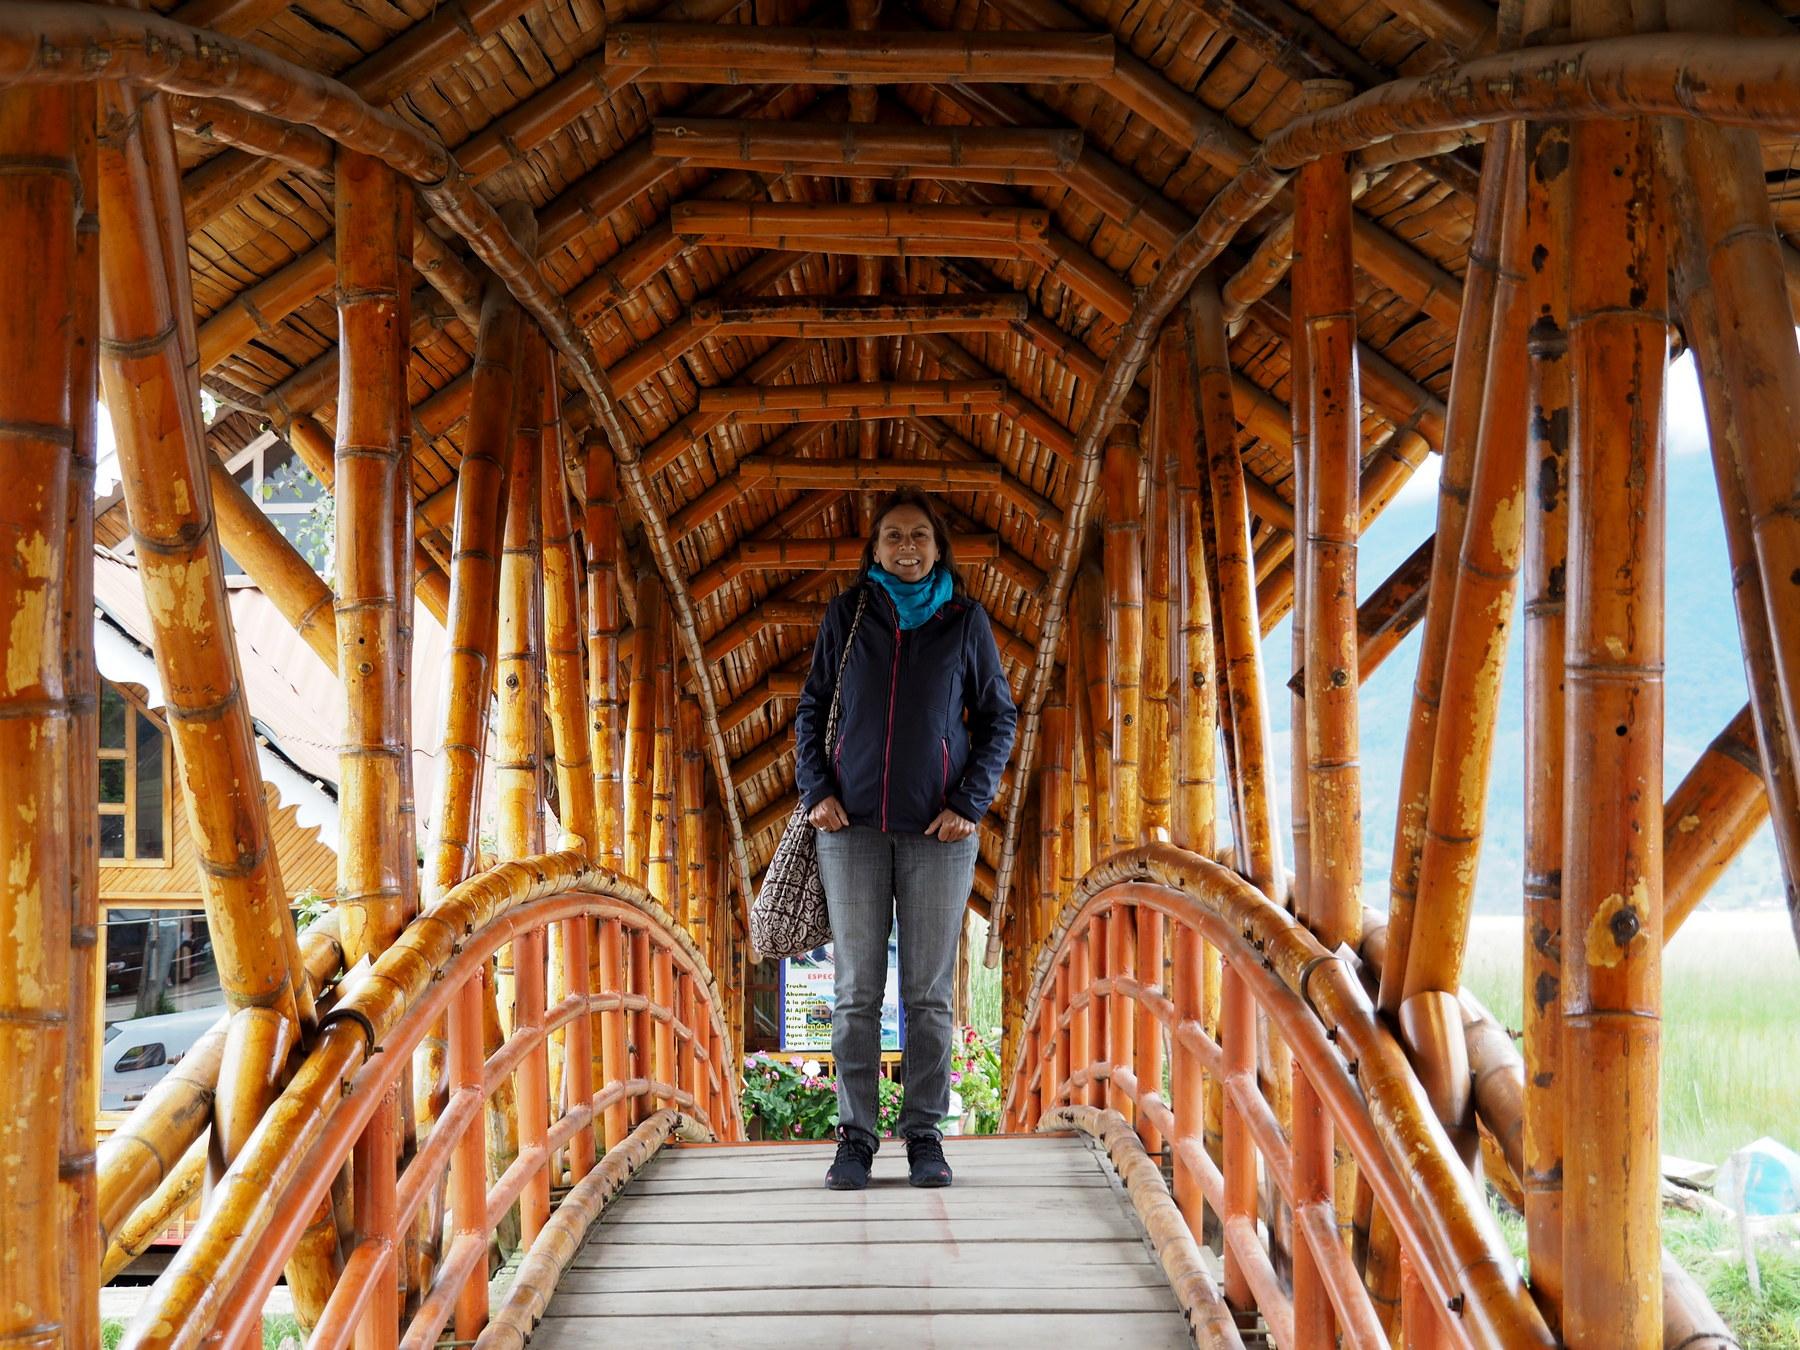 Hübsche Brücke aus Bambus